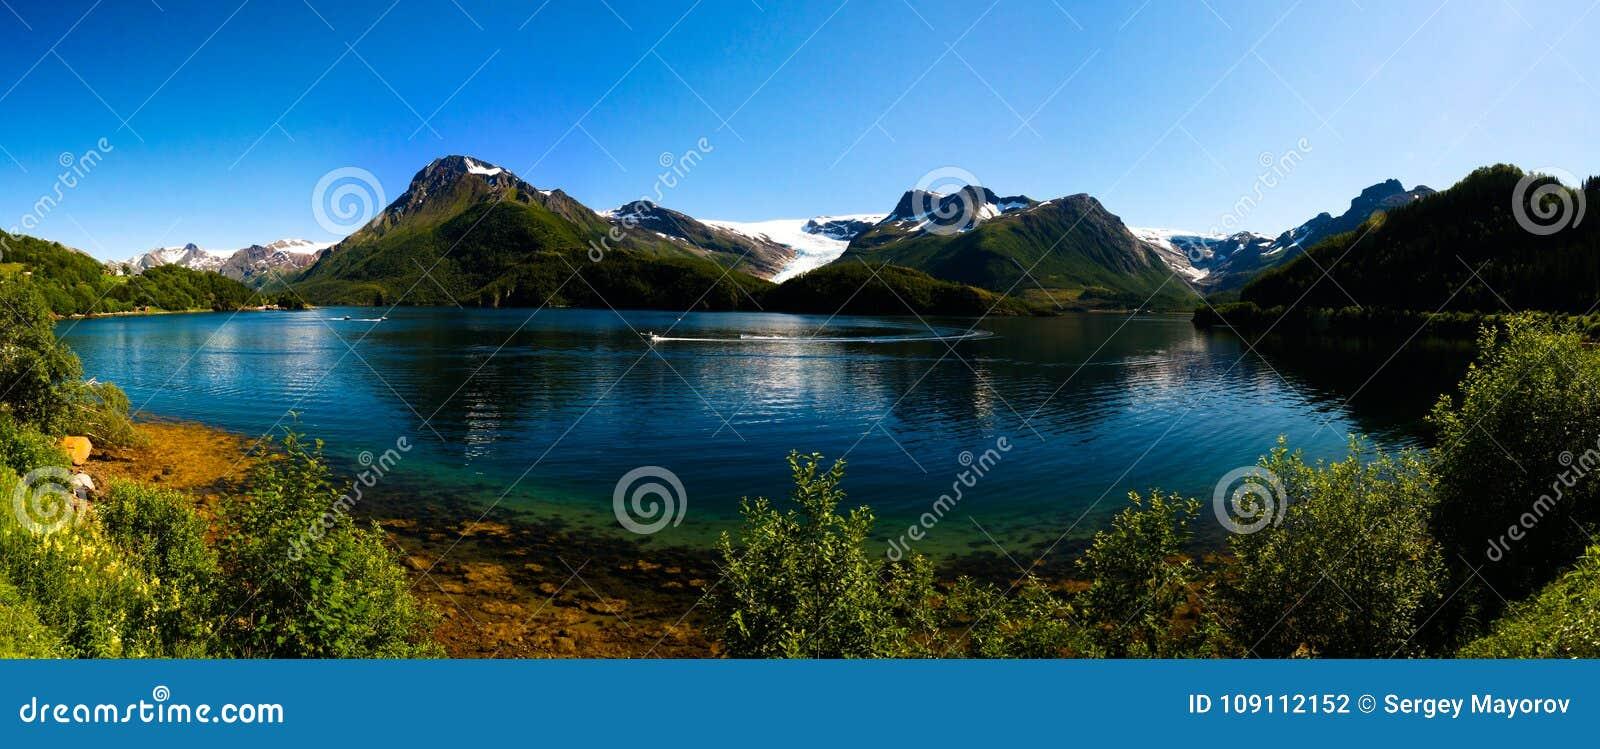 Panorama view to Nordfjorden and Svartisen glacier, Meloy, Norway